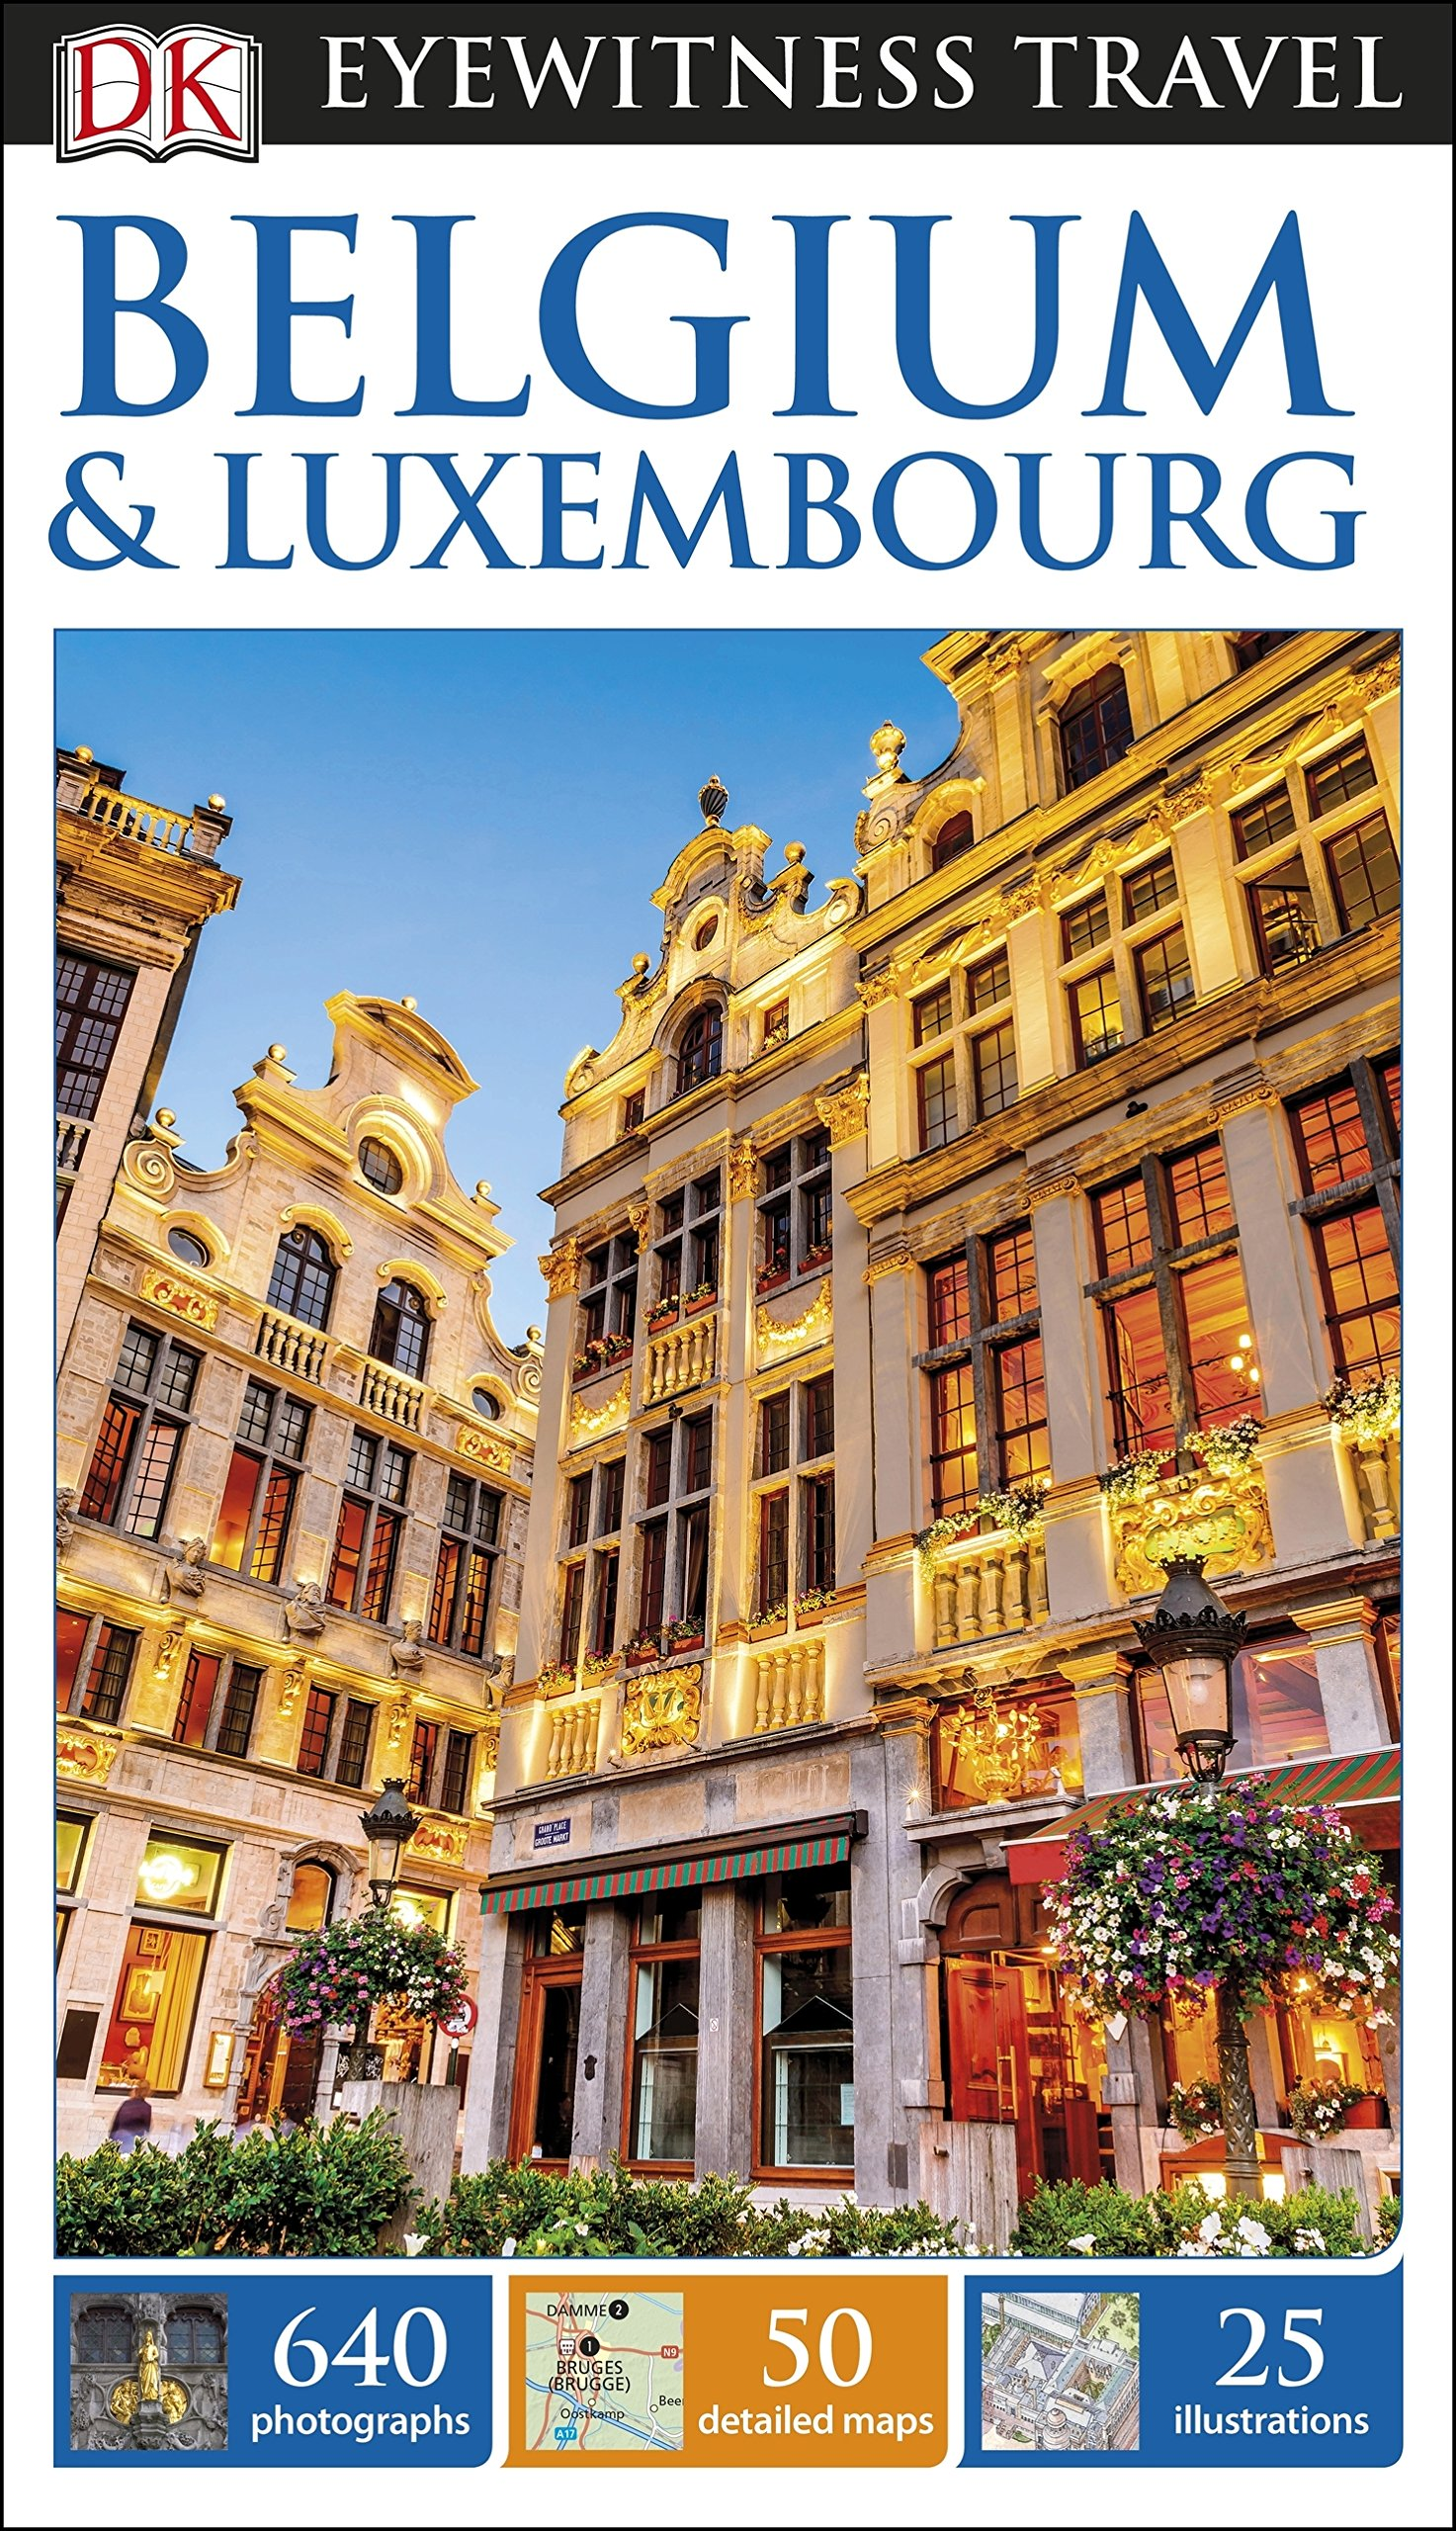 DK Eyewitness Travel Guide Belgium and Luxembourg (Eyewitness Travel Guides)